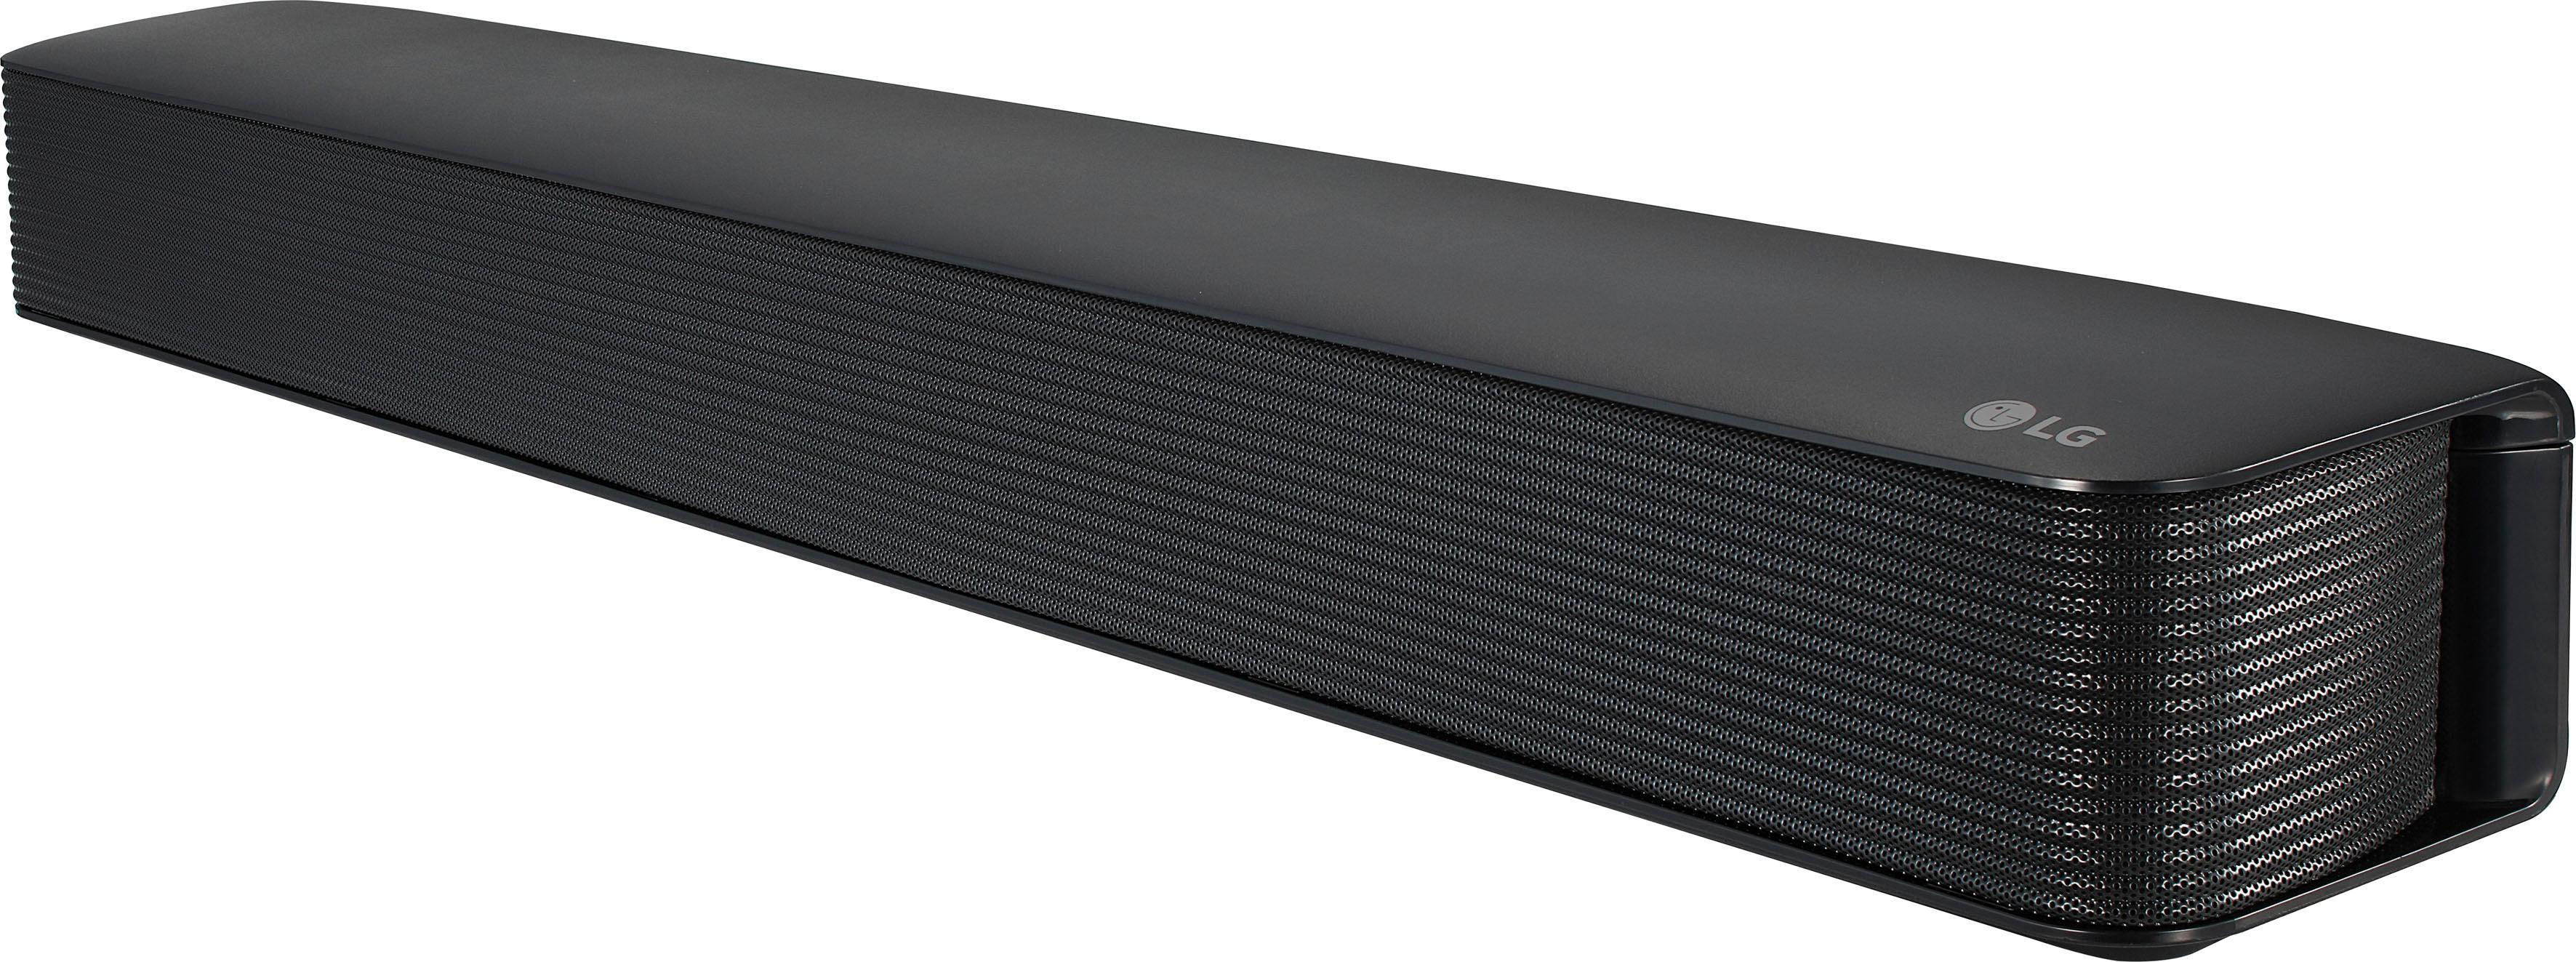 lg sk1 2 0 soundbar bluetooth 40 watt auf rechnung. Black Bedroom Furniture Sets. Home Design Ideas